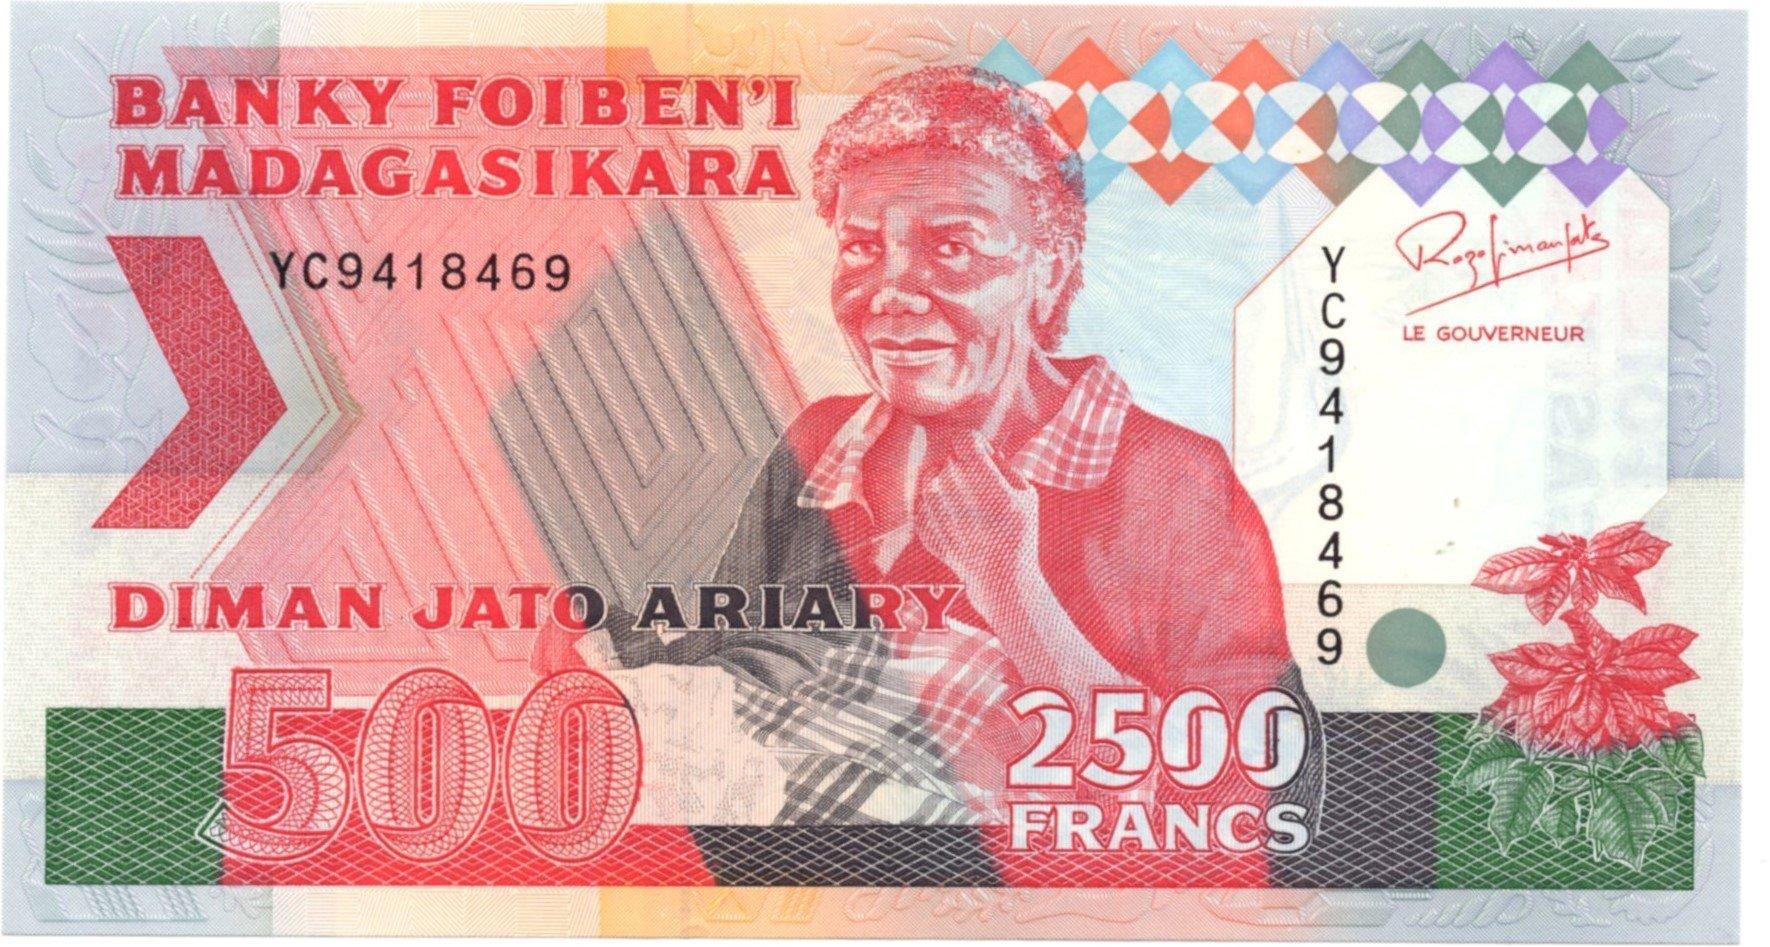 Madagascar 2500 francs 1994